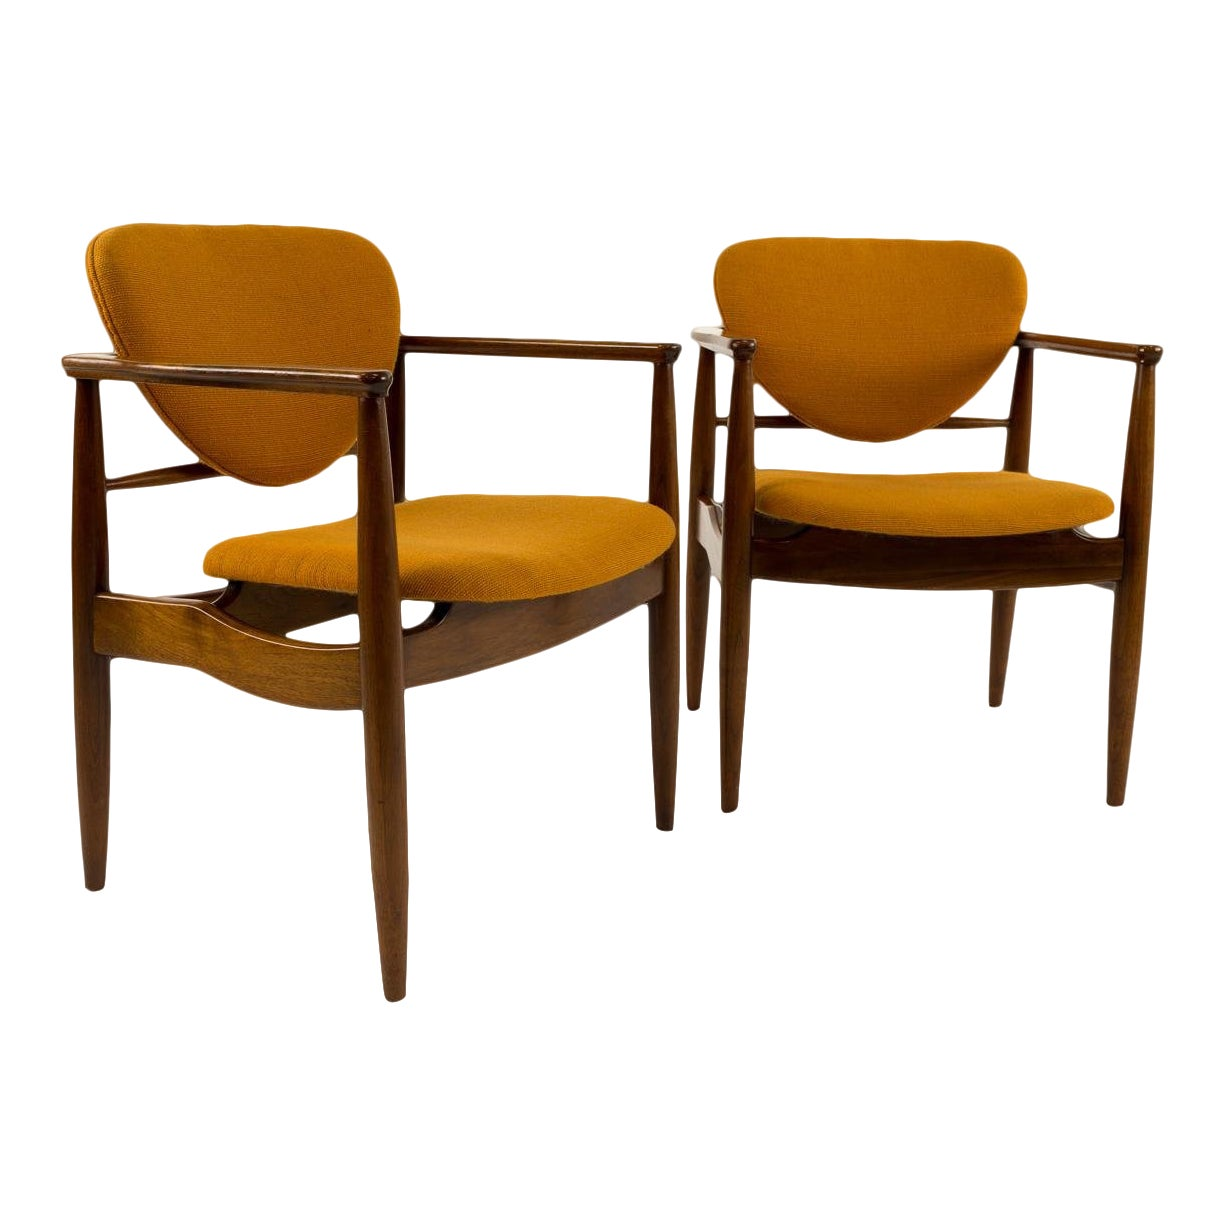 Finn juhl style mid century modern chairs a pair chairish